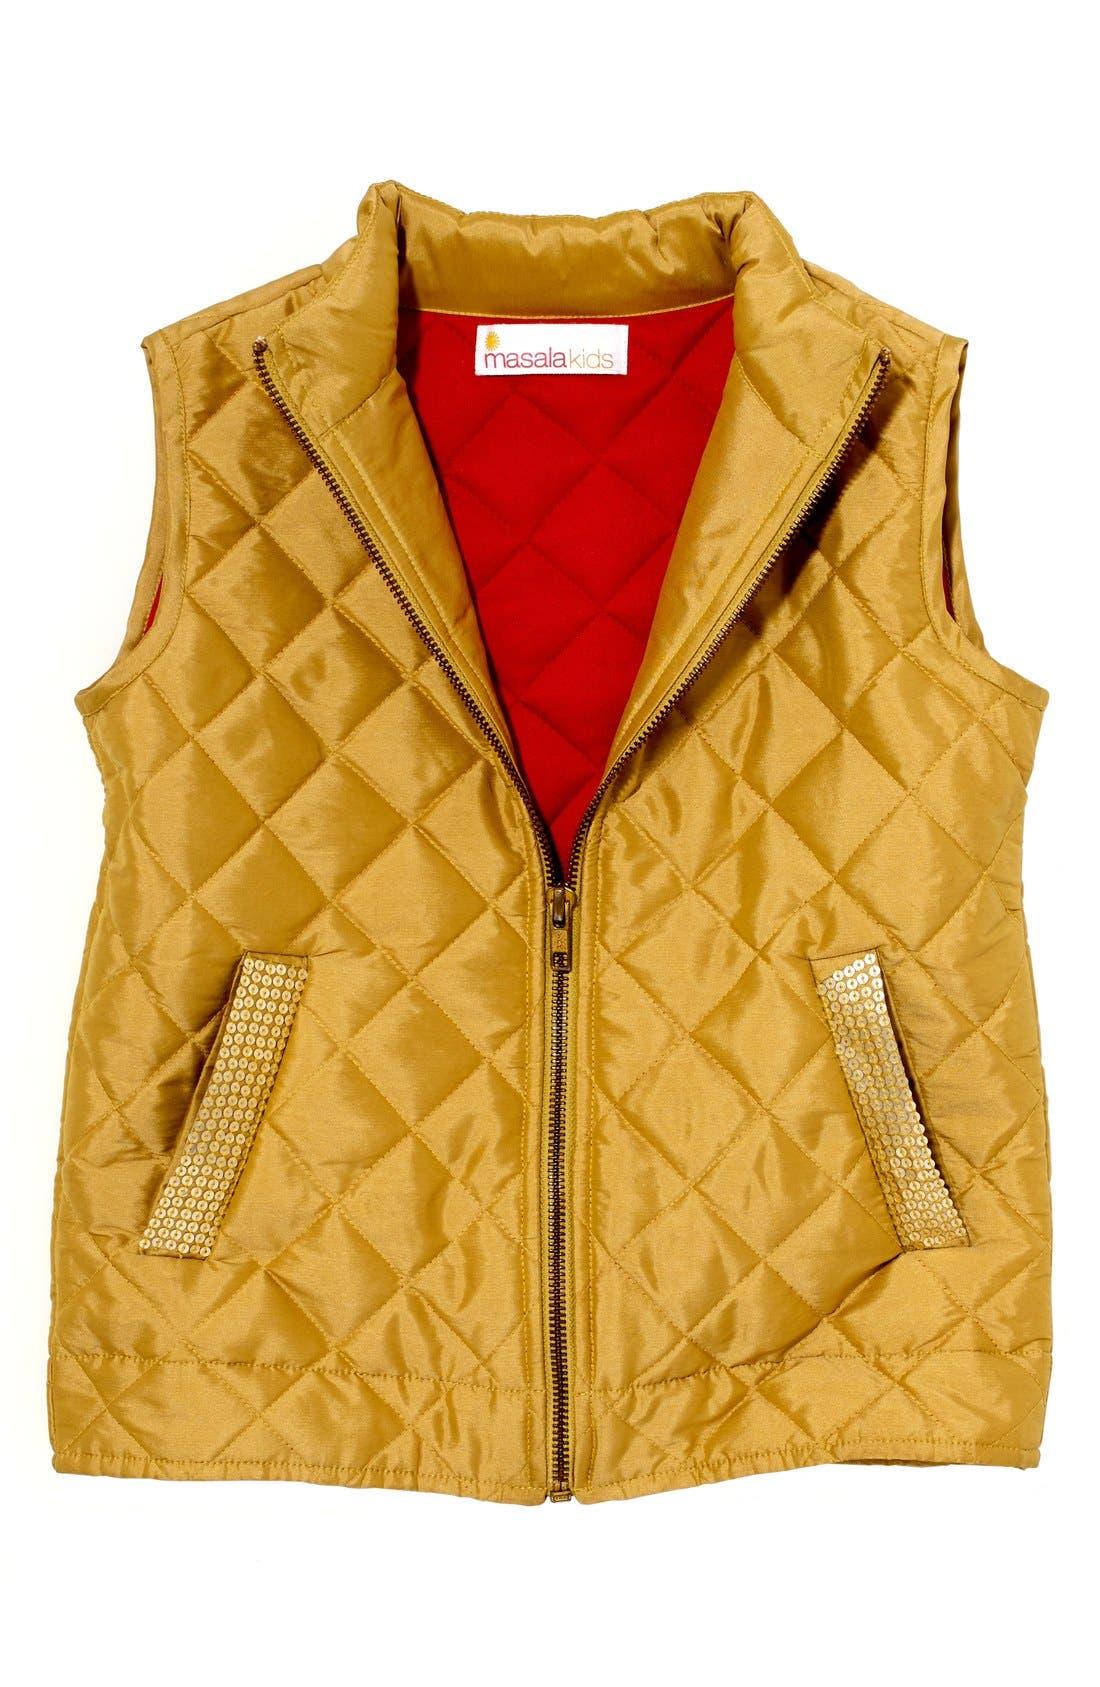 Alternate Image 1 Selected - Masala Baby 'Estelle' Quilted Vest (Toddler Girls, Little Girls & Big Girls)